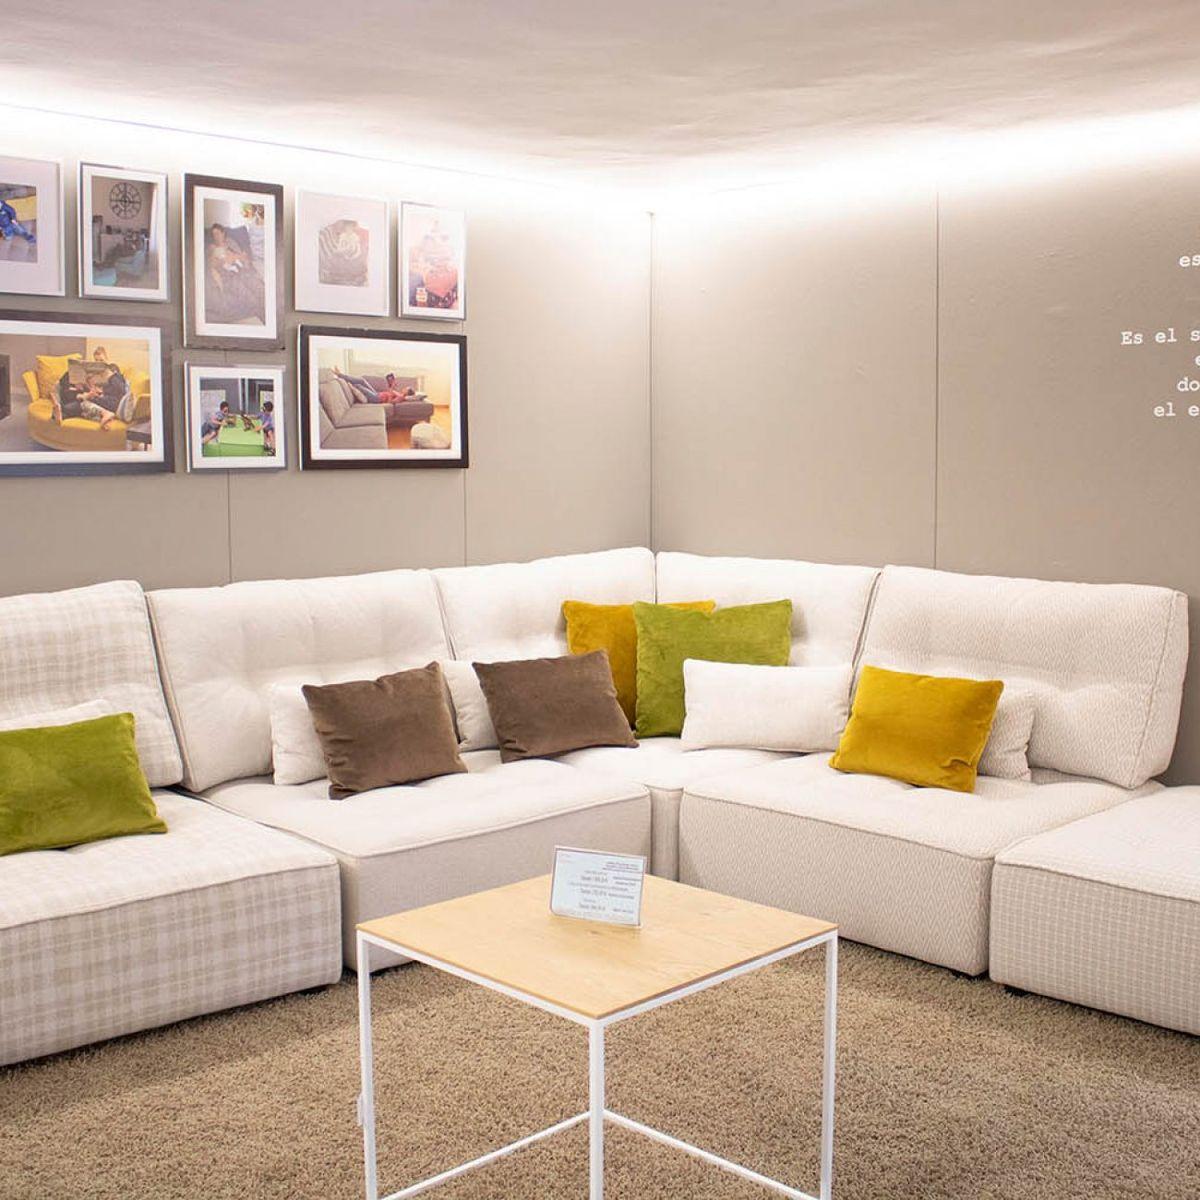 Home Interiores